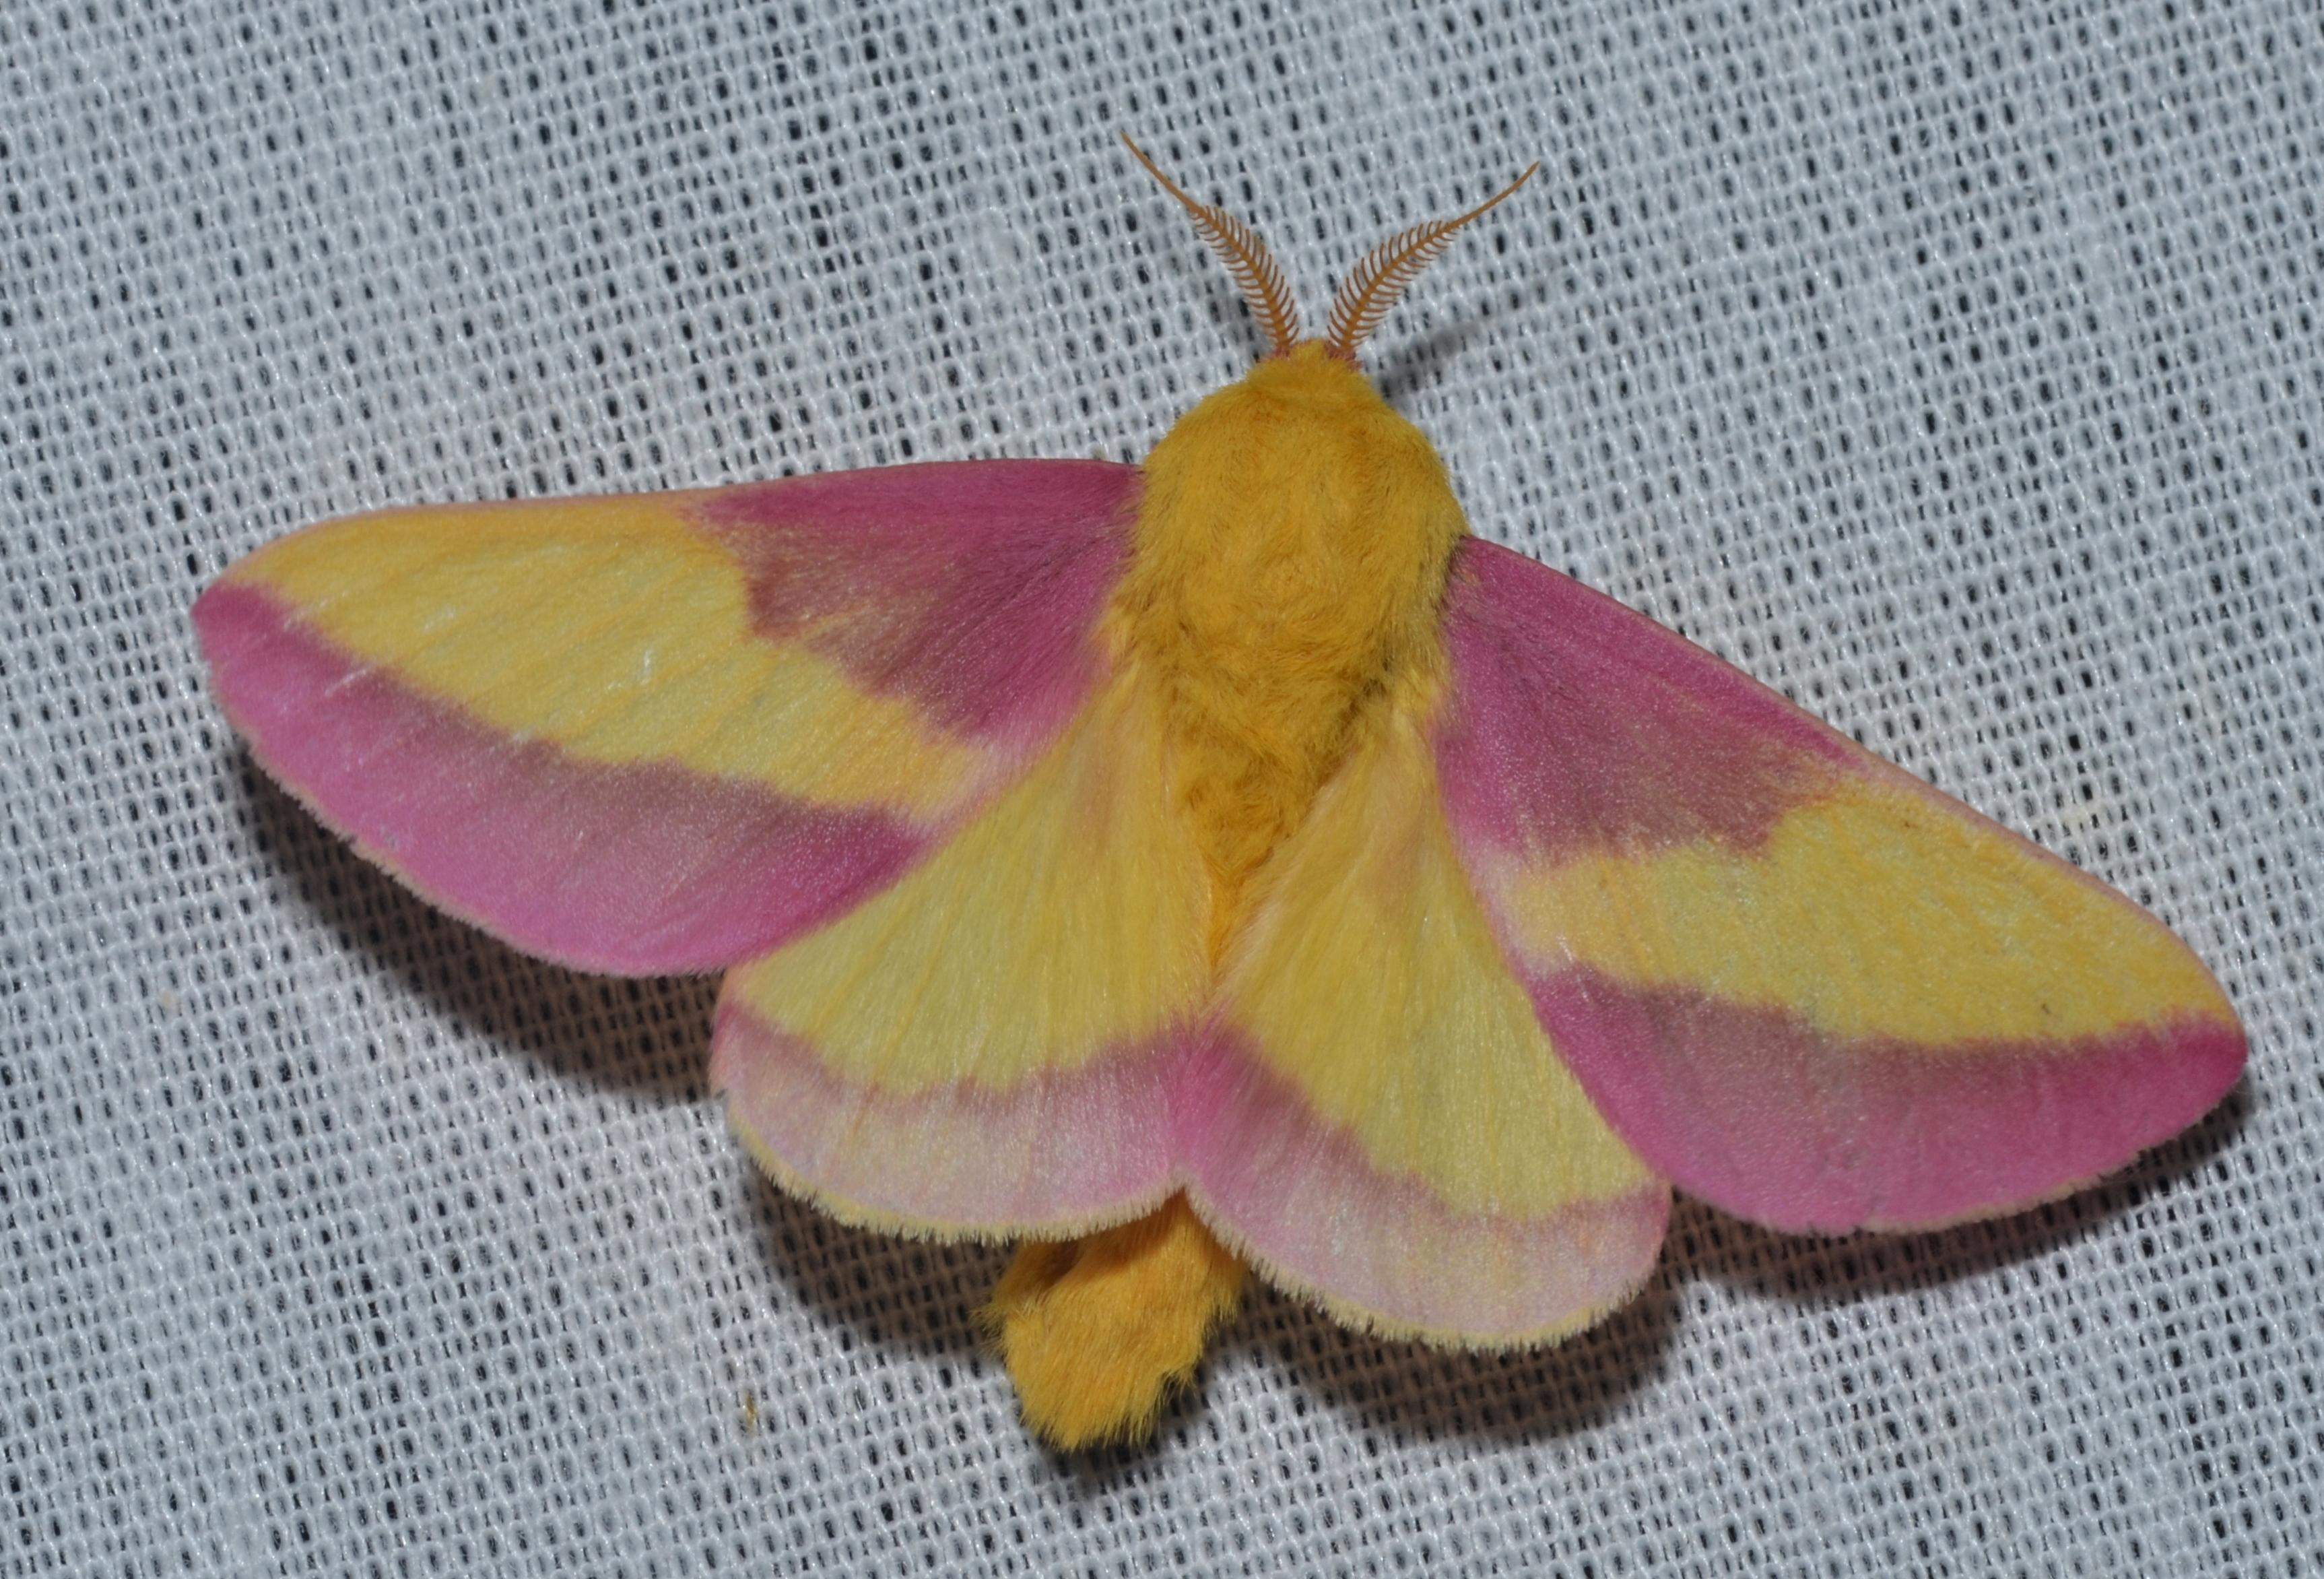 File:- 7715 – Dryocampa rubicunda – Rosy Maple Moth ... - photo#10